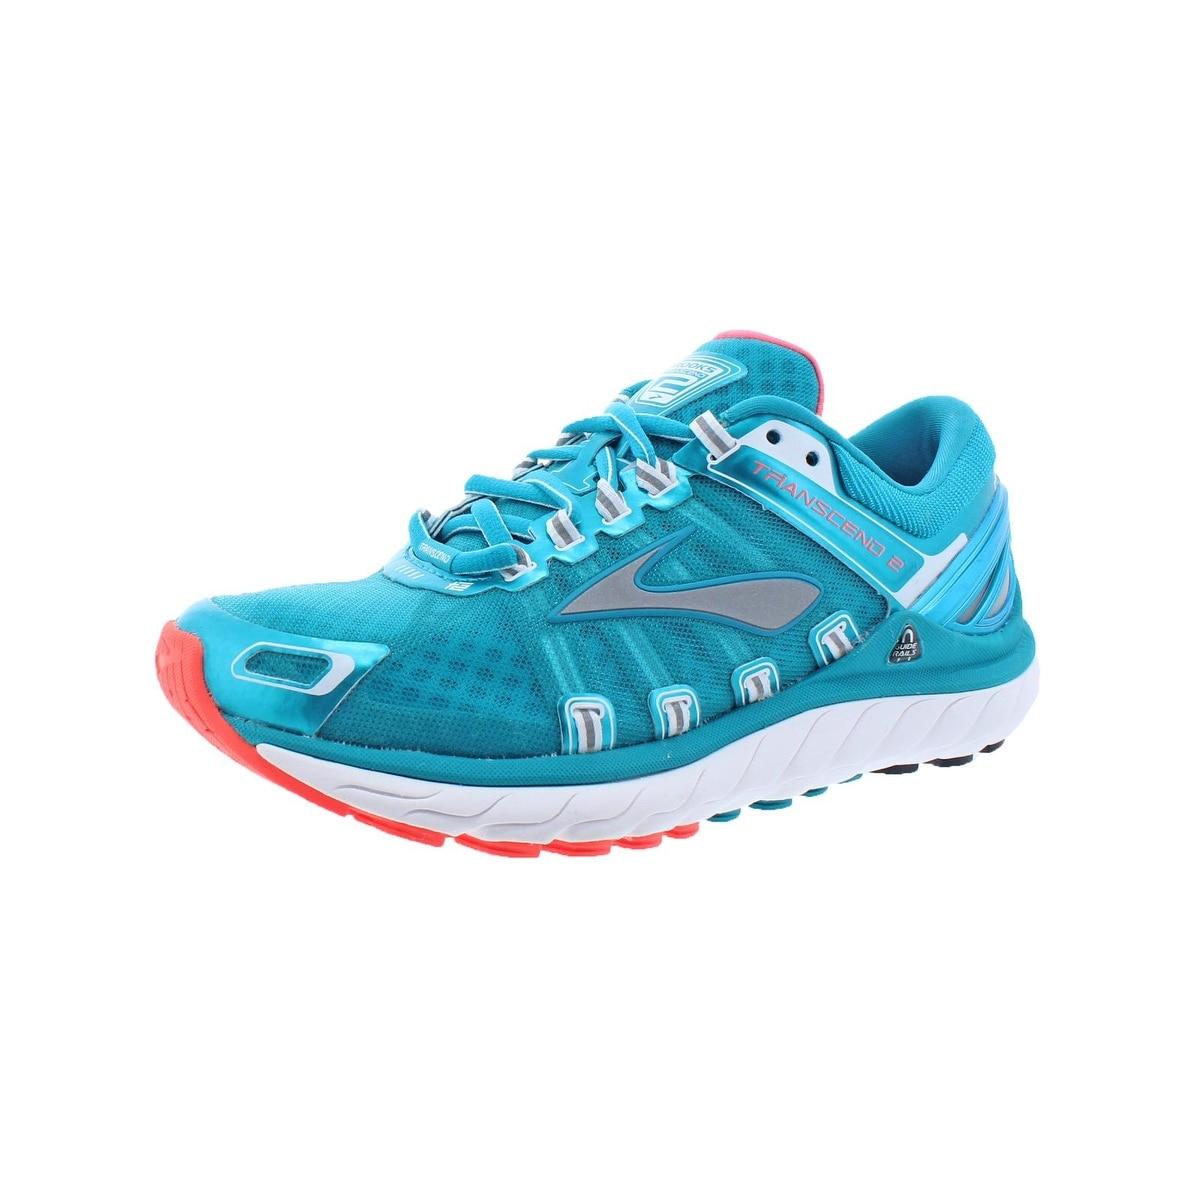 3d10f18fc0db Shop Brooks Womens Transcend 2 Running Shoes Super DNA Training ...